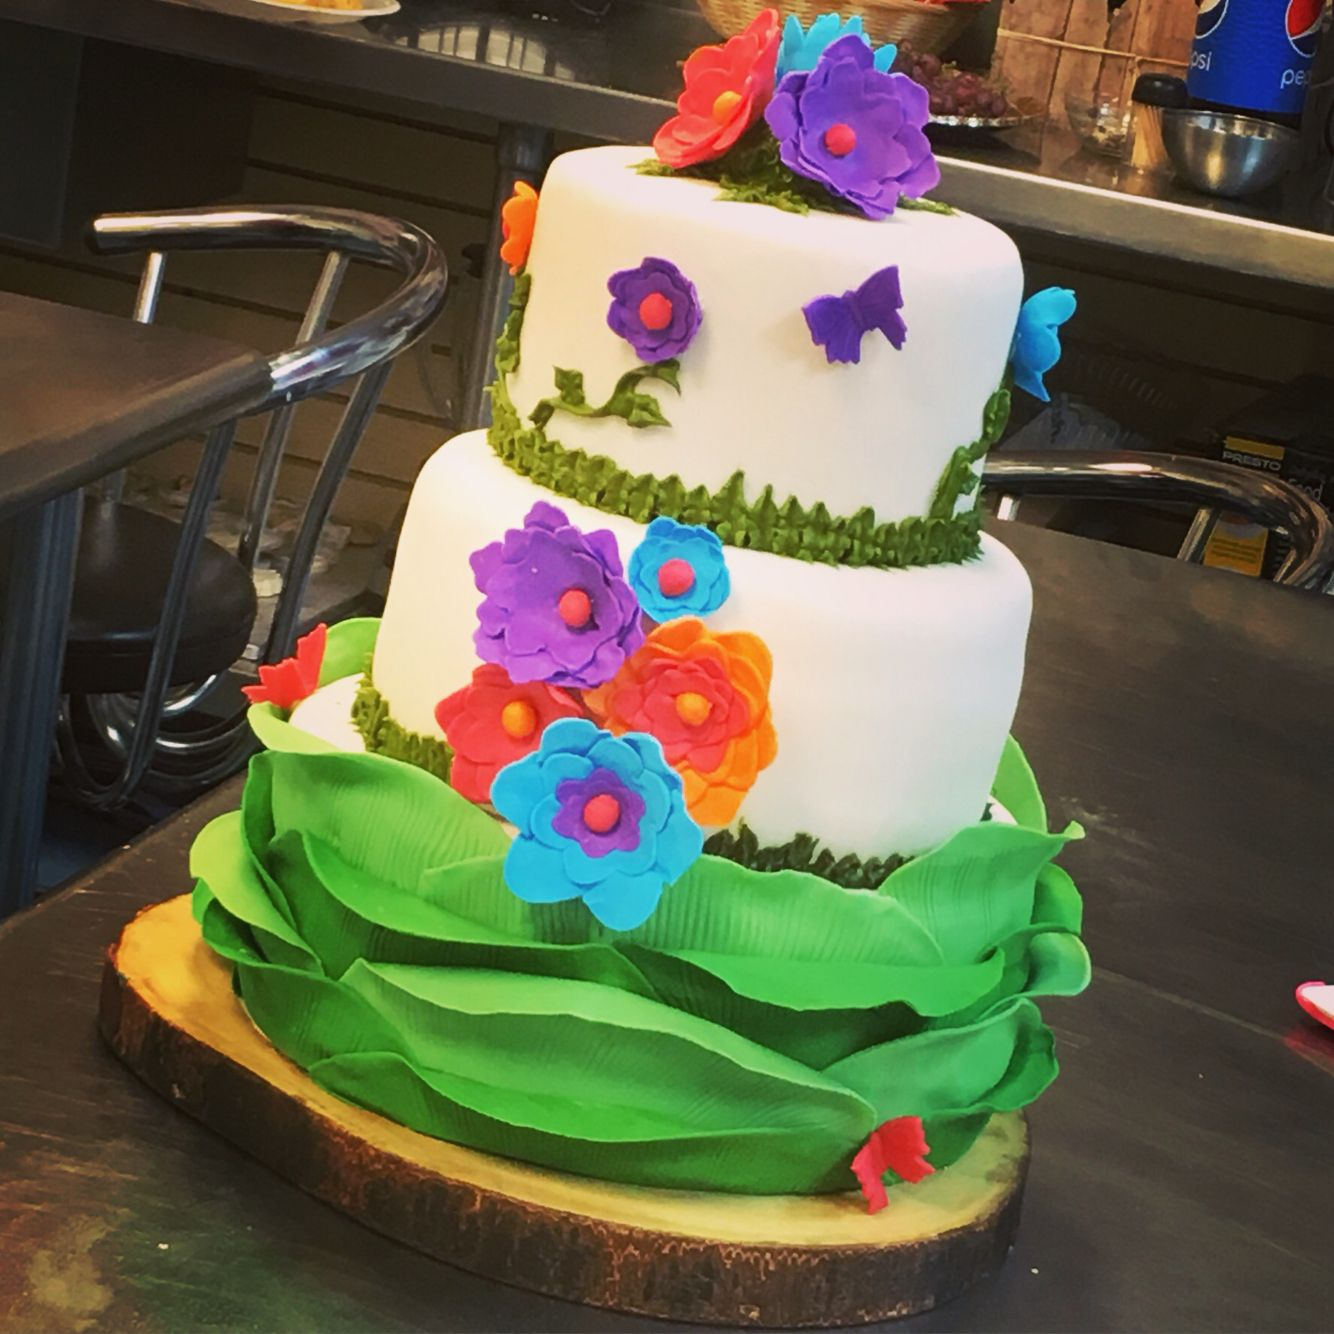 Feeling aruba cake inspiration ivettes nutty kitchen